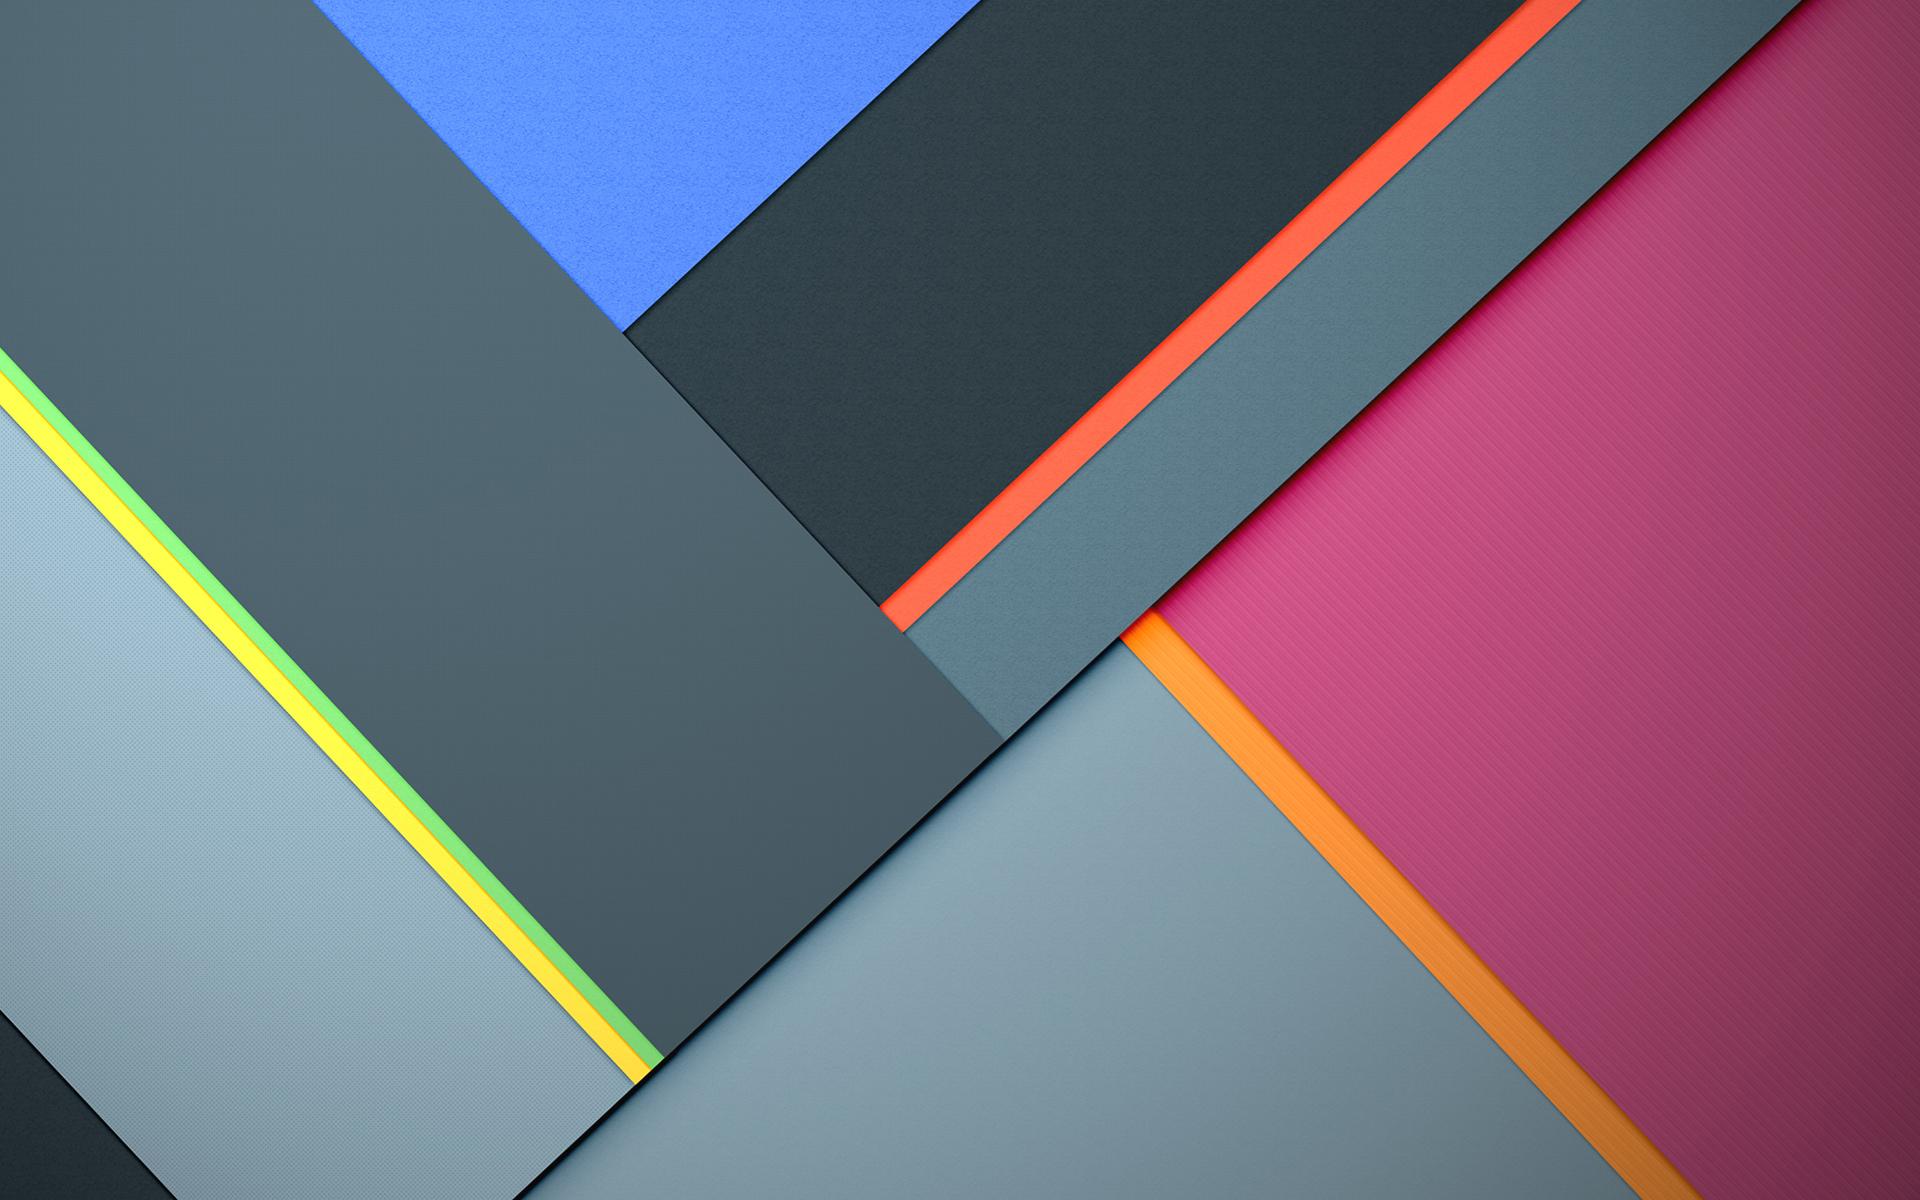 27 best wallpapers for windows 10 spicytweaks for Window design hd image